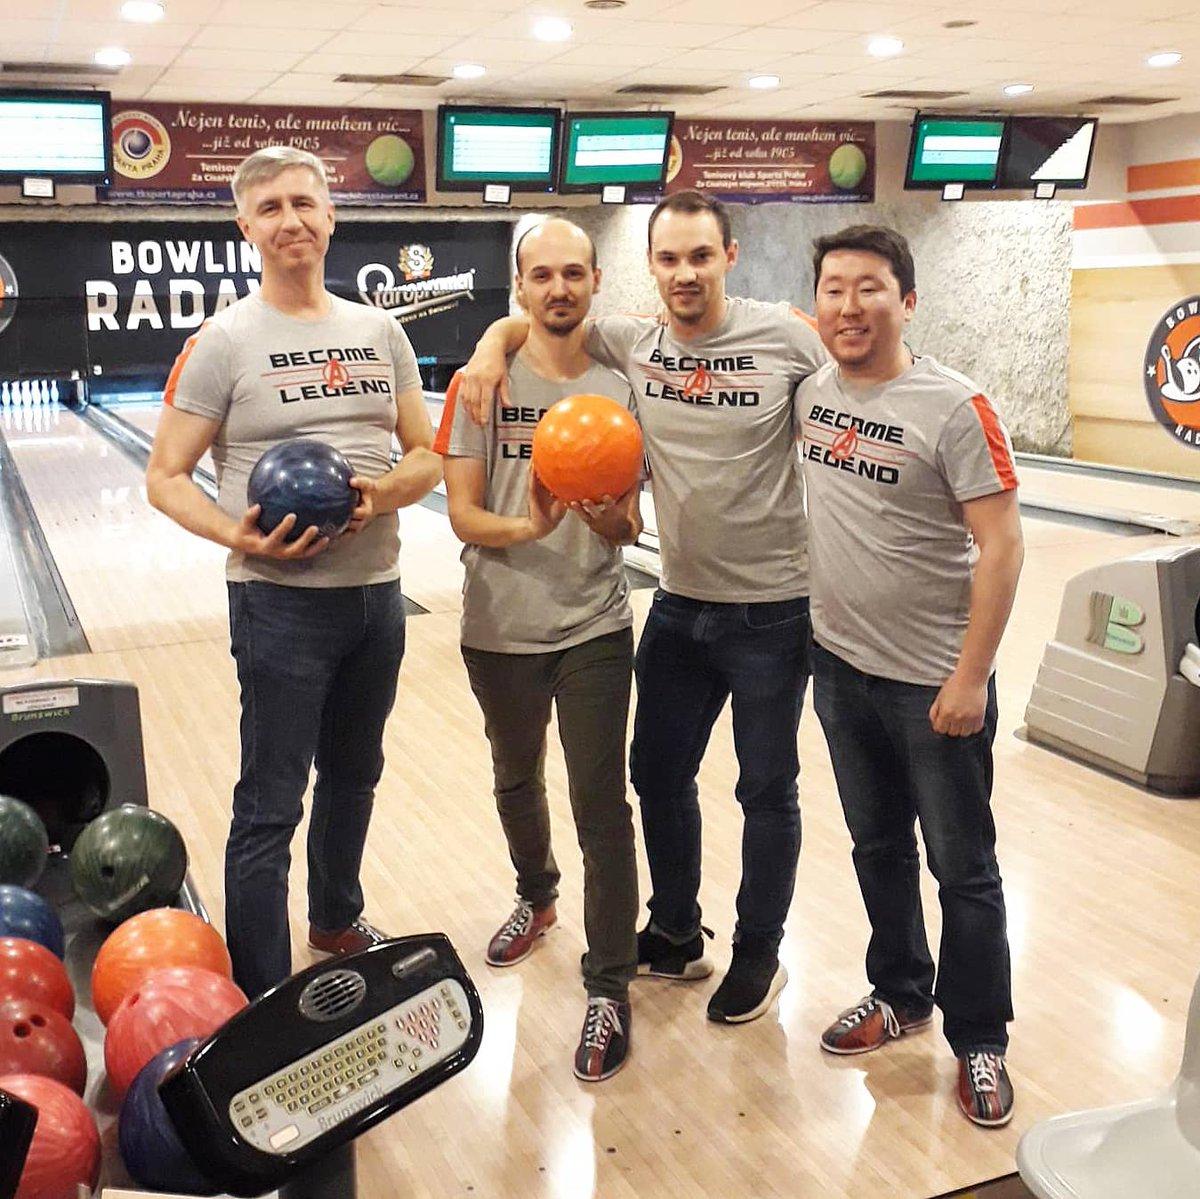 Throwback to #Bowling night 🎳  #team #avengers #legends #game #playtime #teamwork #fun #bowlingtime #strike #sport #bowlingshirts #friends #match #radava #prague #techcrew #apollodivision🚀 https://t.co/mwAorgMDSn